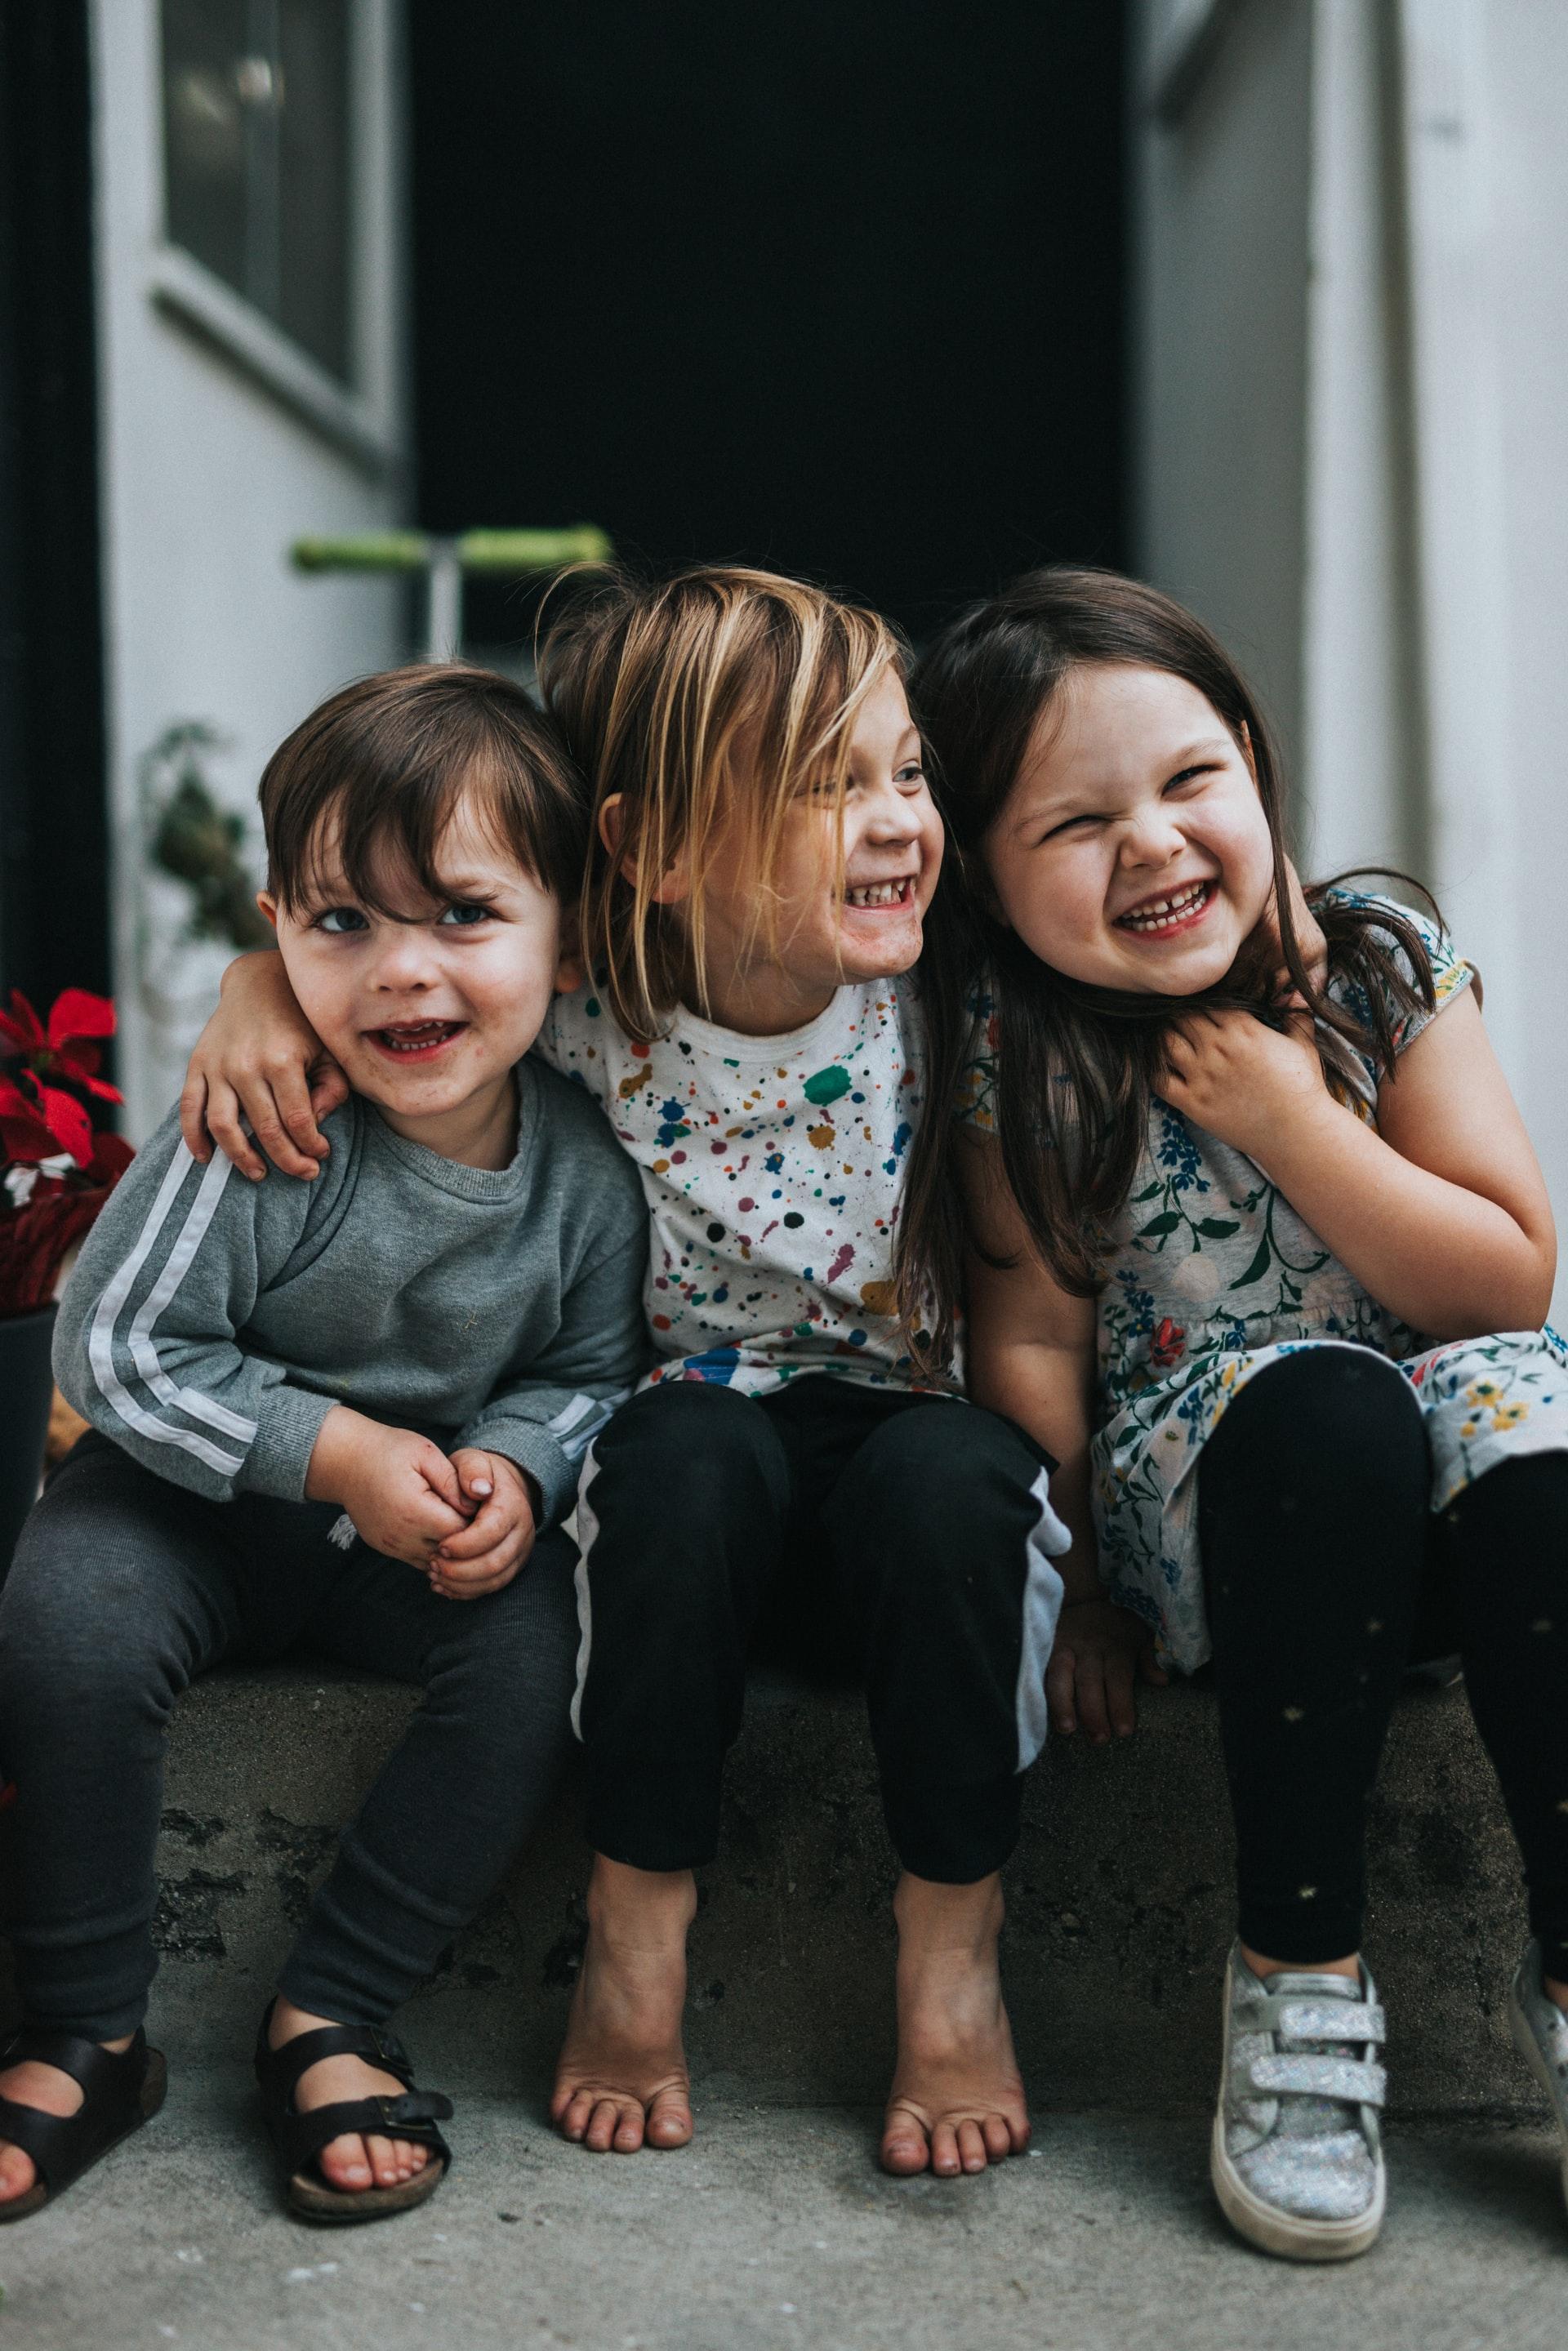 kolme nauravaa lasta istuu portailla